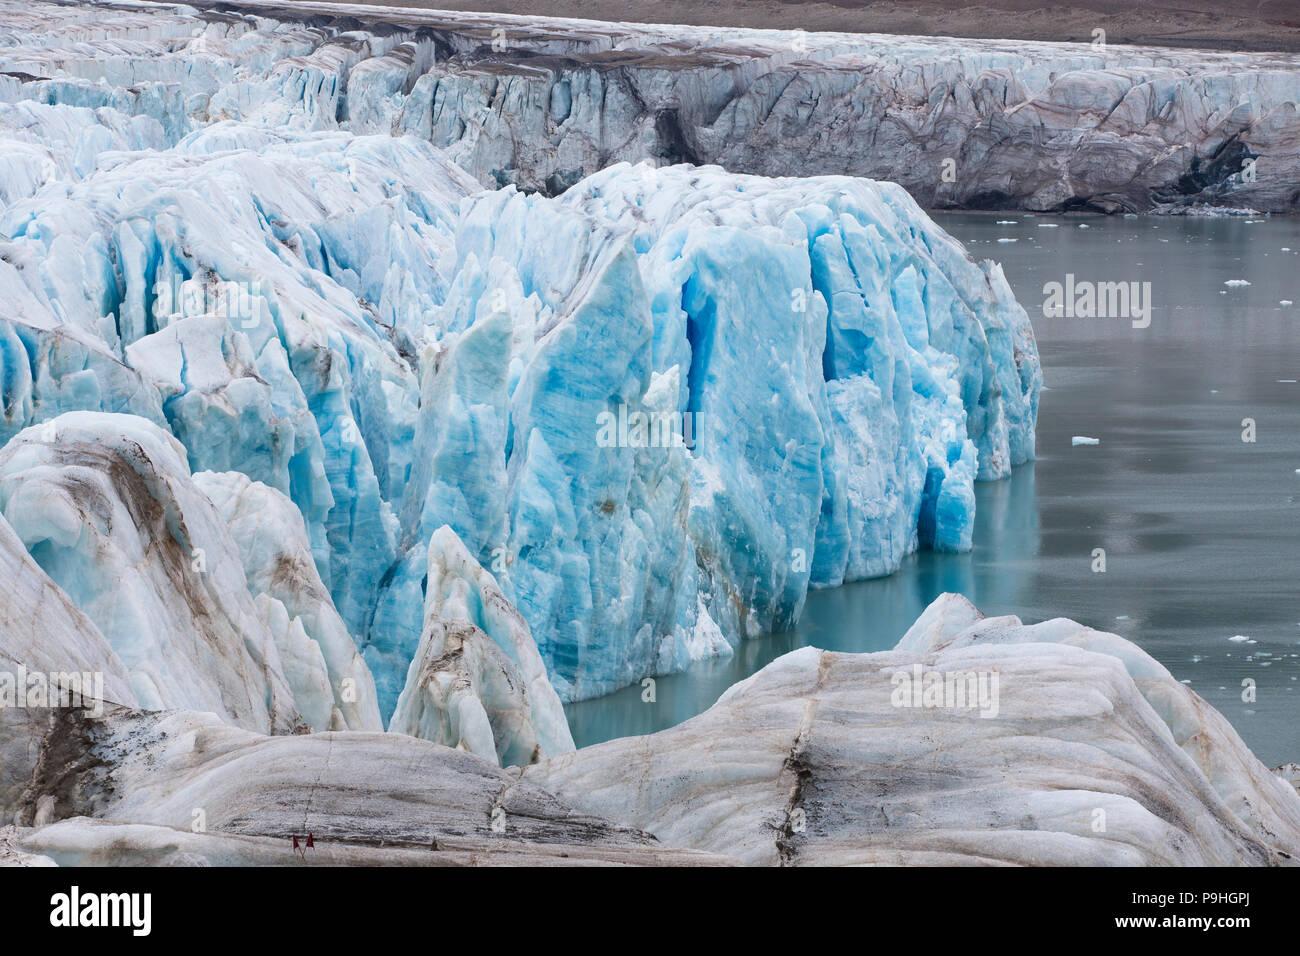 Fourteenth of July Glacier, Svalbard - Stock Image